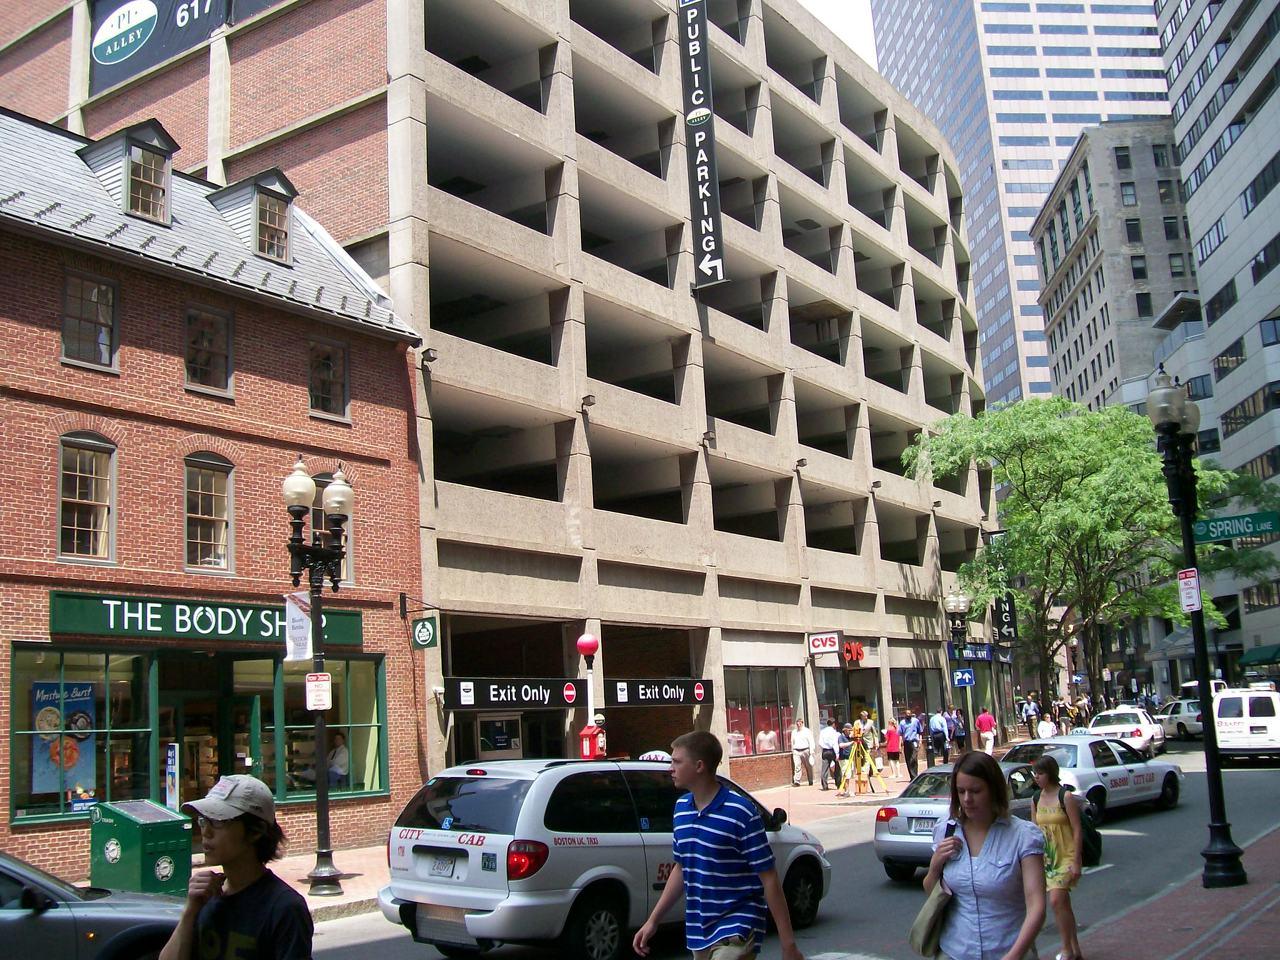 Bank of Brazil Boston, MA